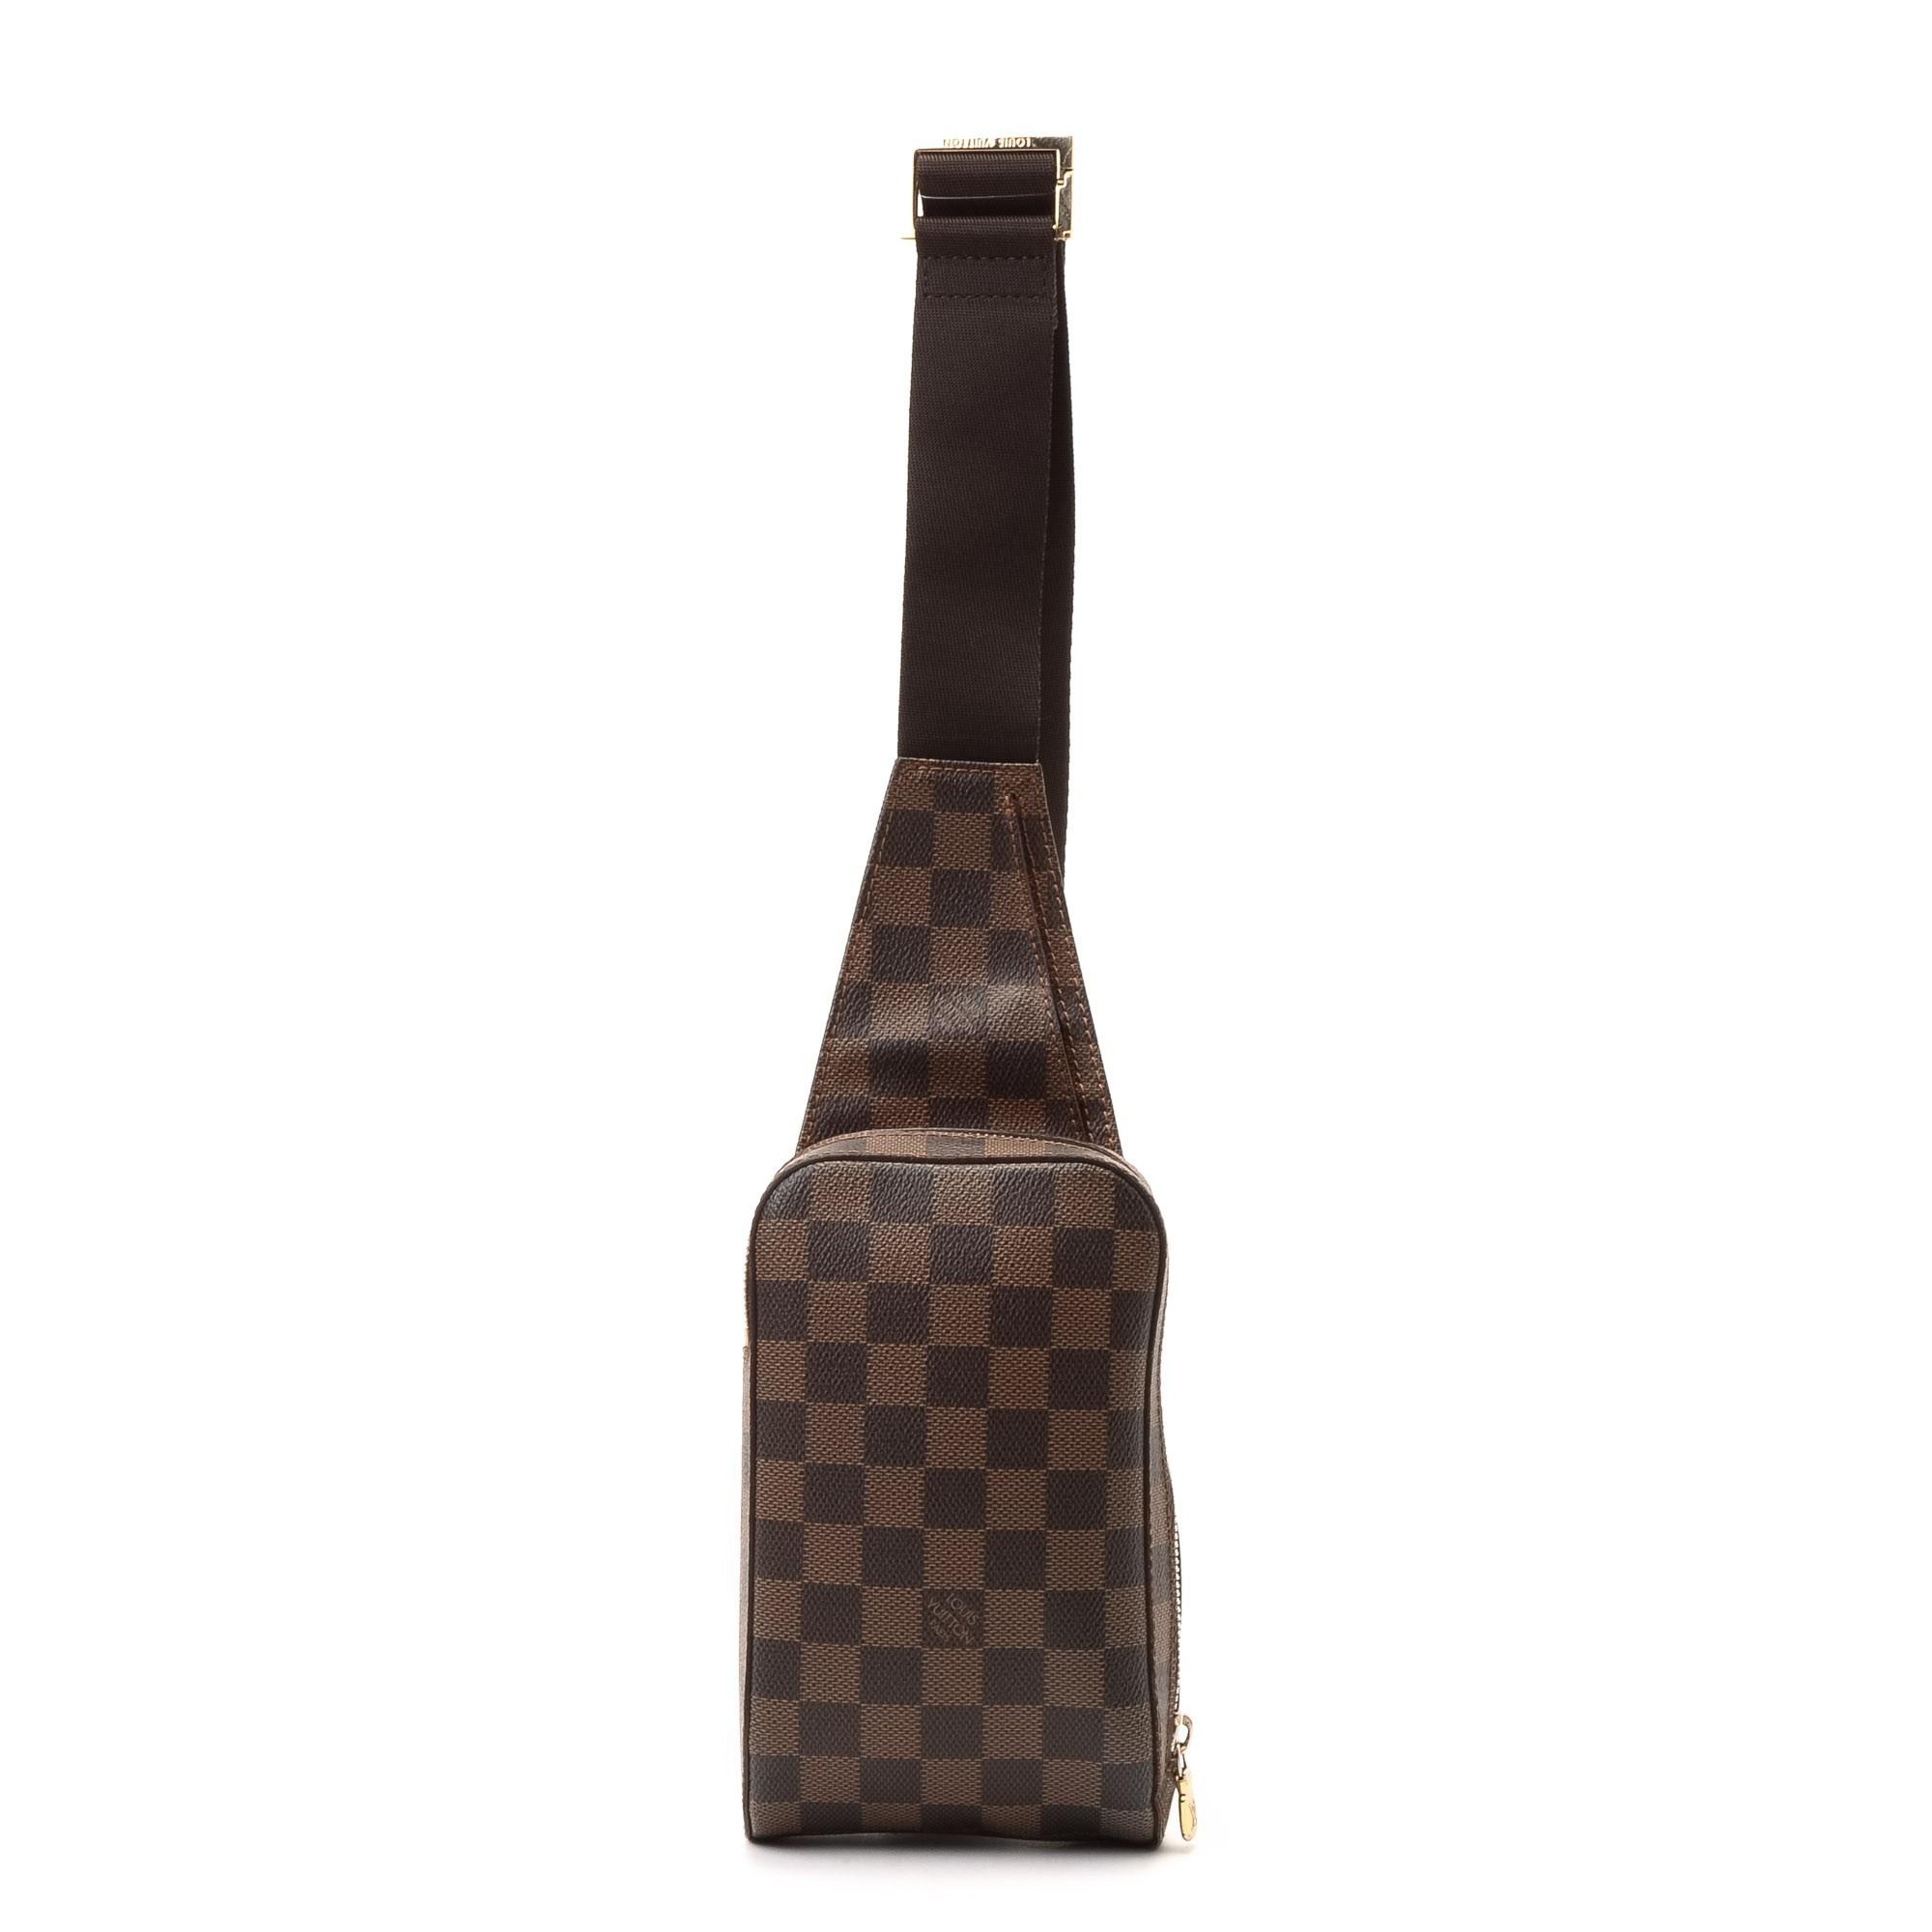 Louis Vuitton Damier Ebene Shoulder Bag 108